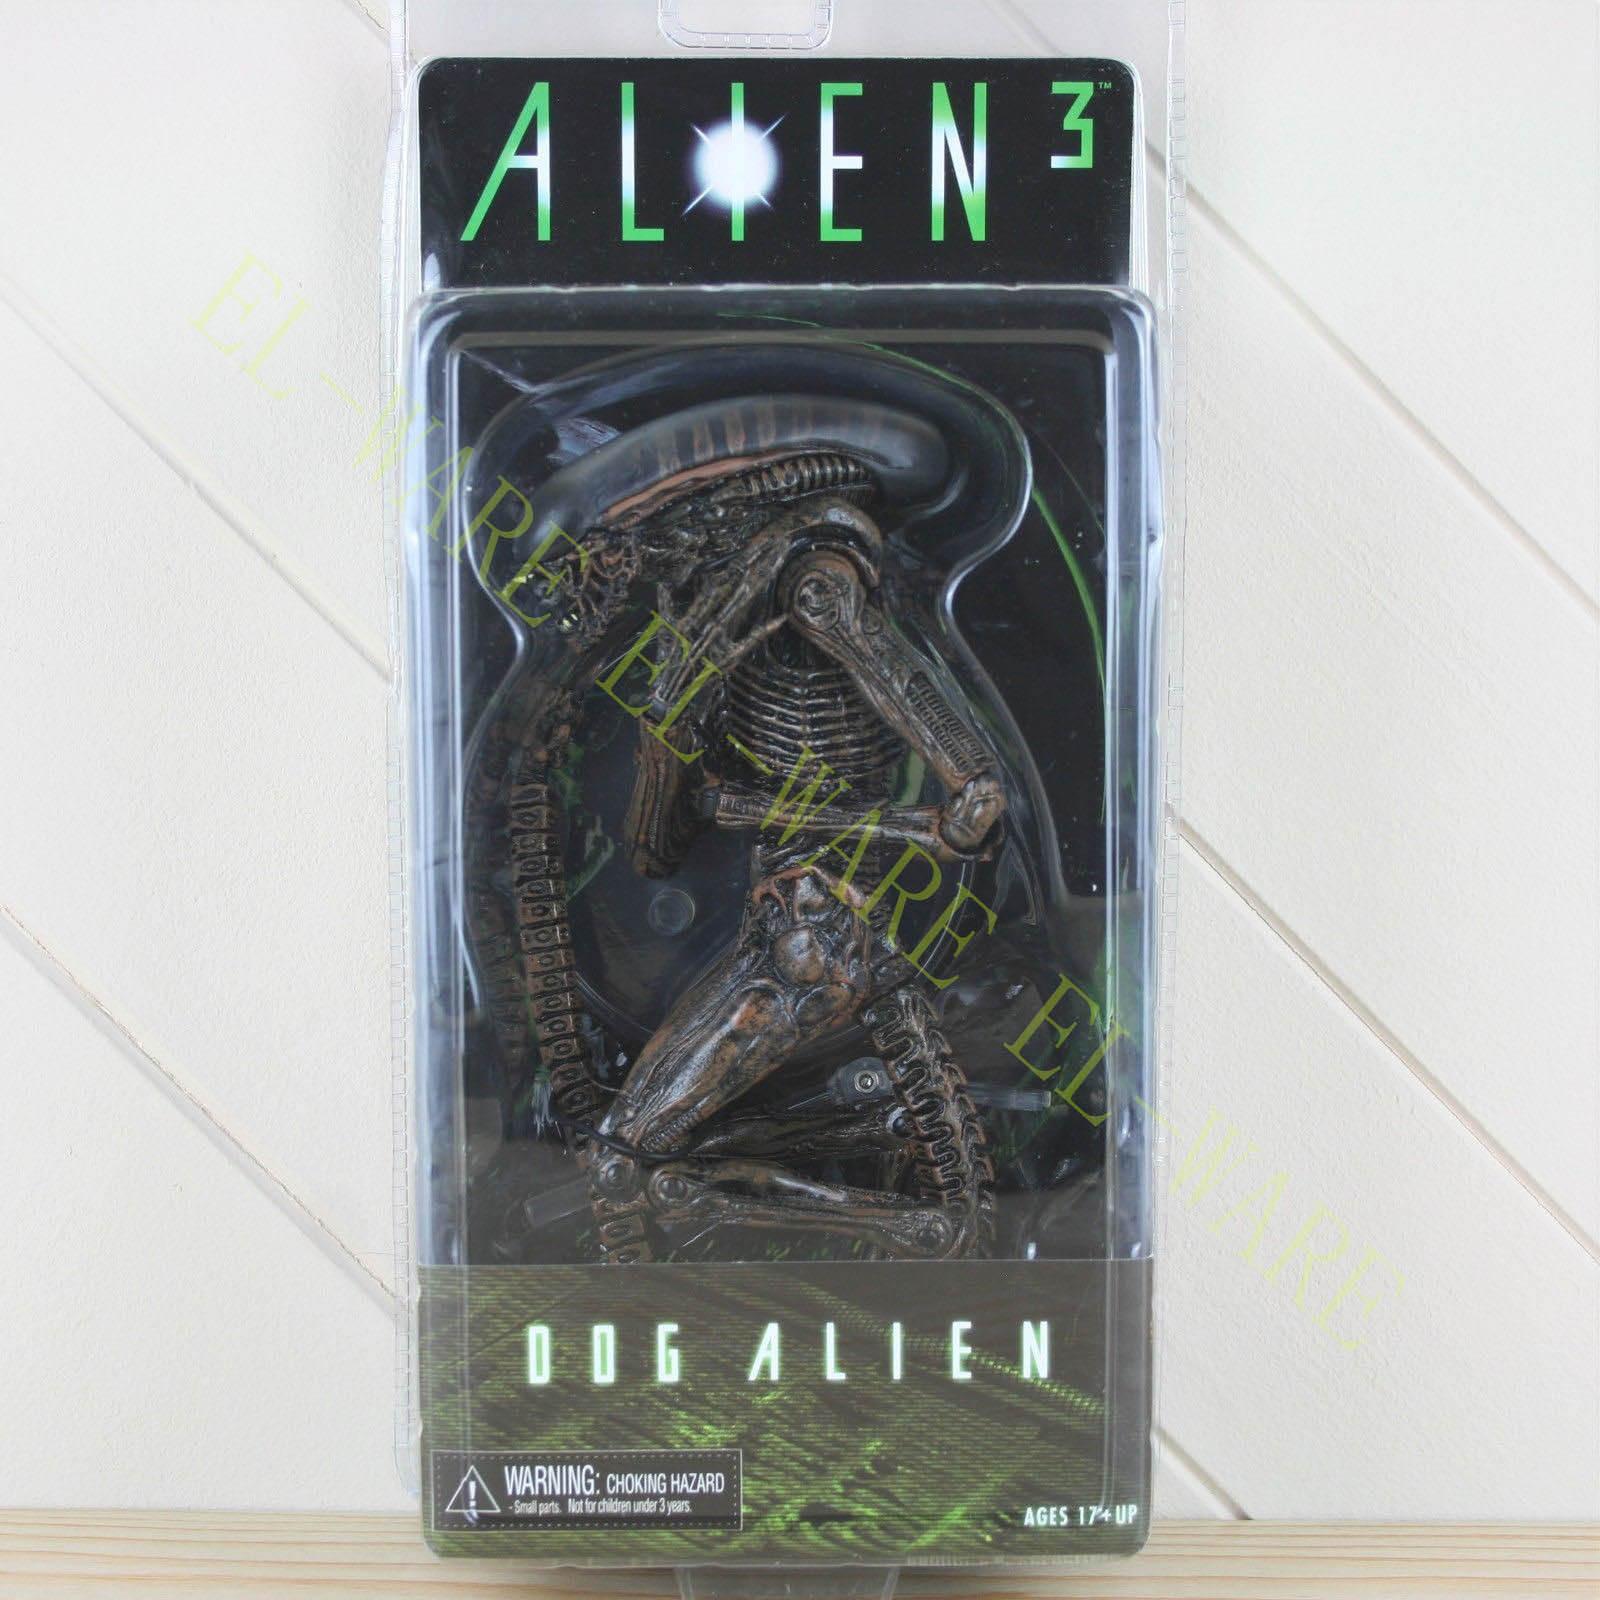 US $20 98 20% OFF|NECA Aliens 3 Series 8 Alien Brown Variant Xenomorph Dog 7